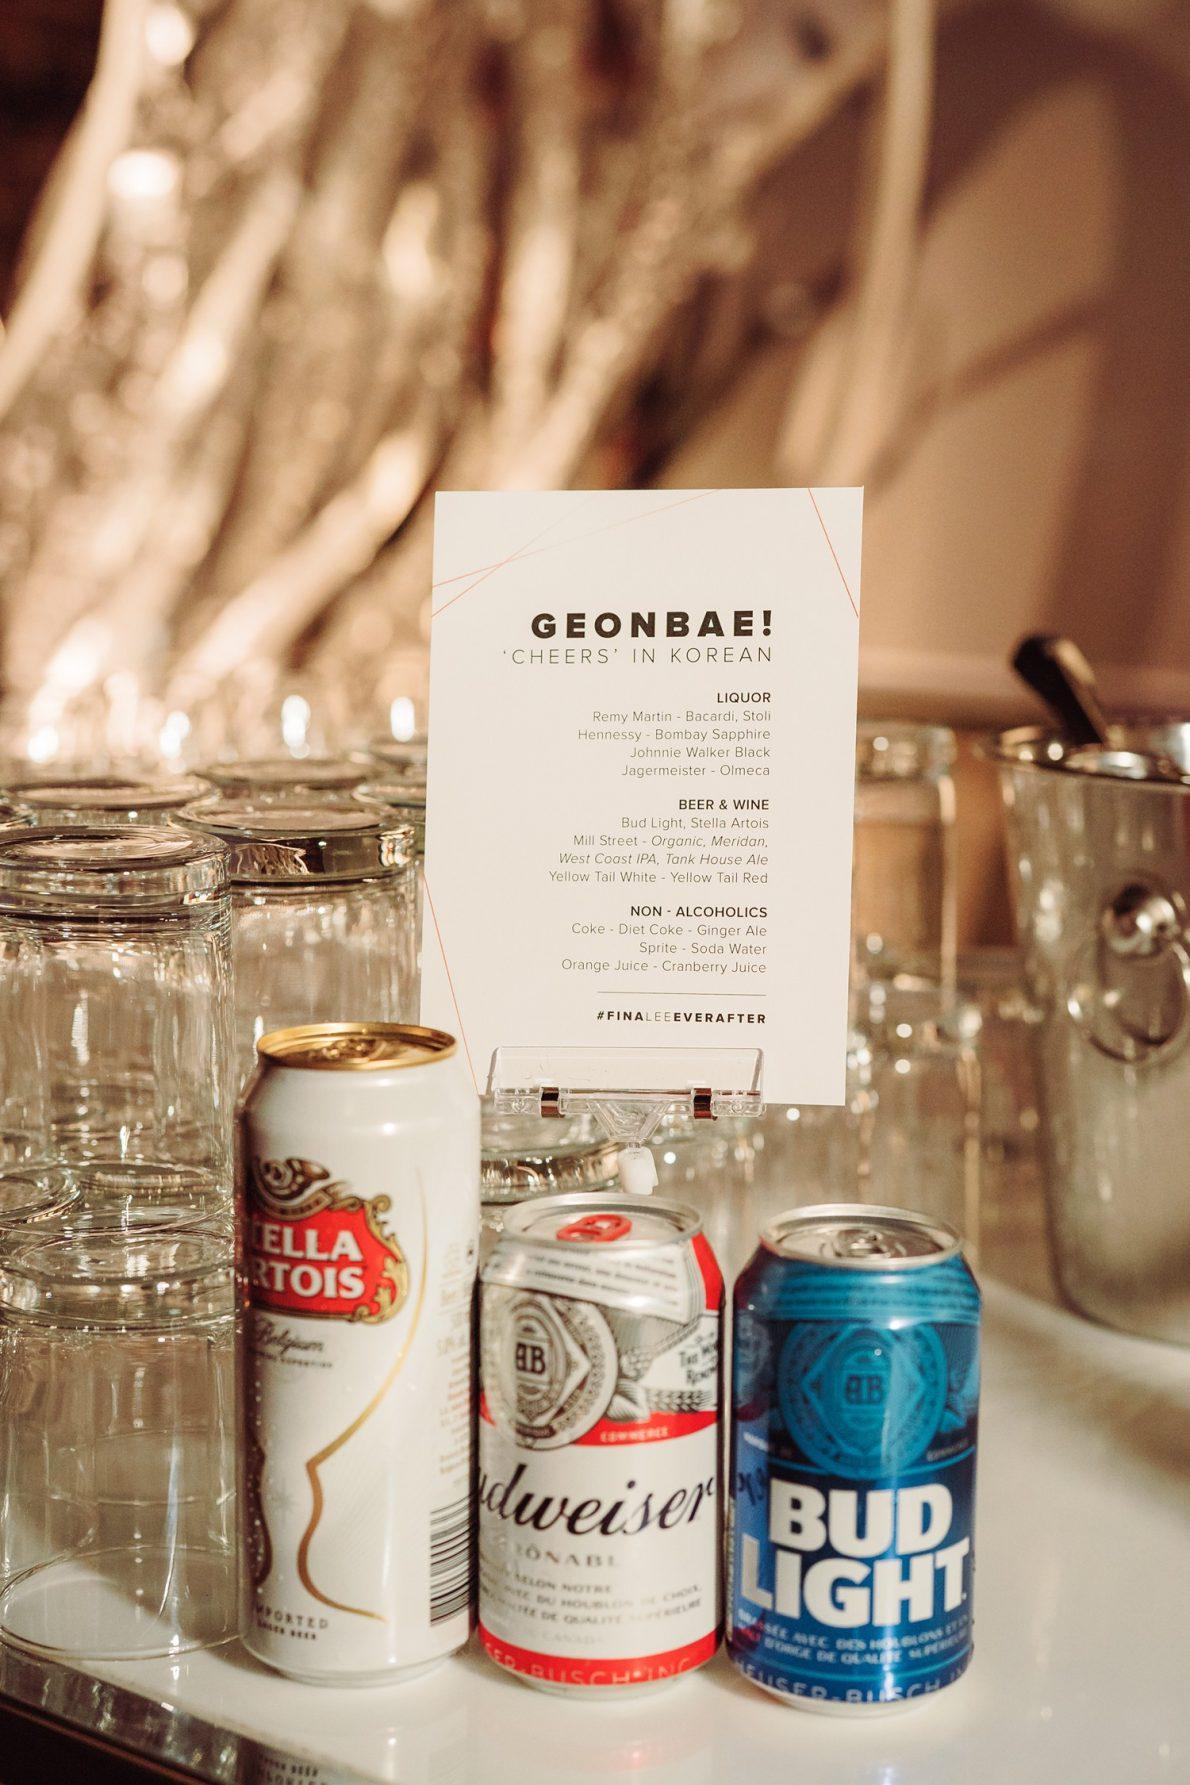 Wedding_Open_Bar_Distillery_District_Thompson_Landry_Gallery_Toronto_Wedding_Photos-Rhythm_Photography